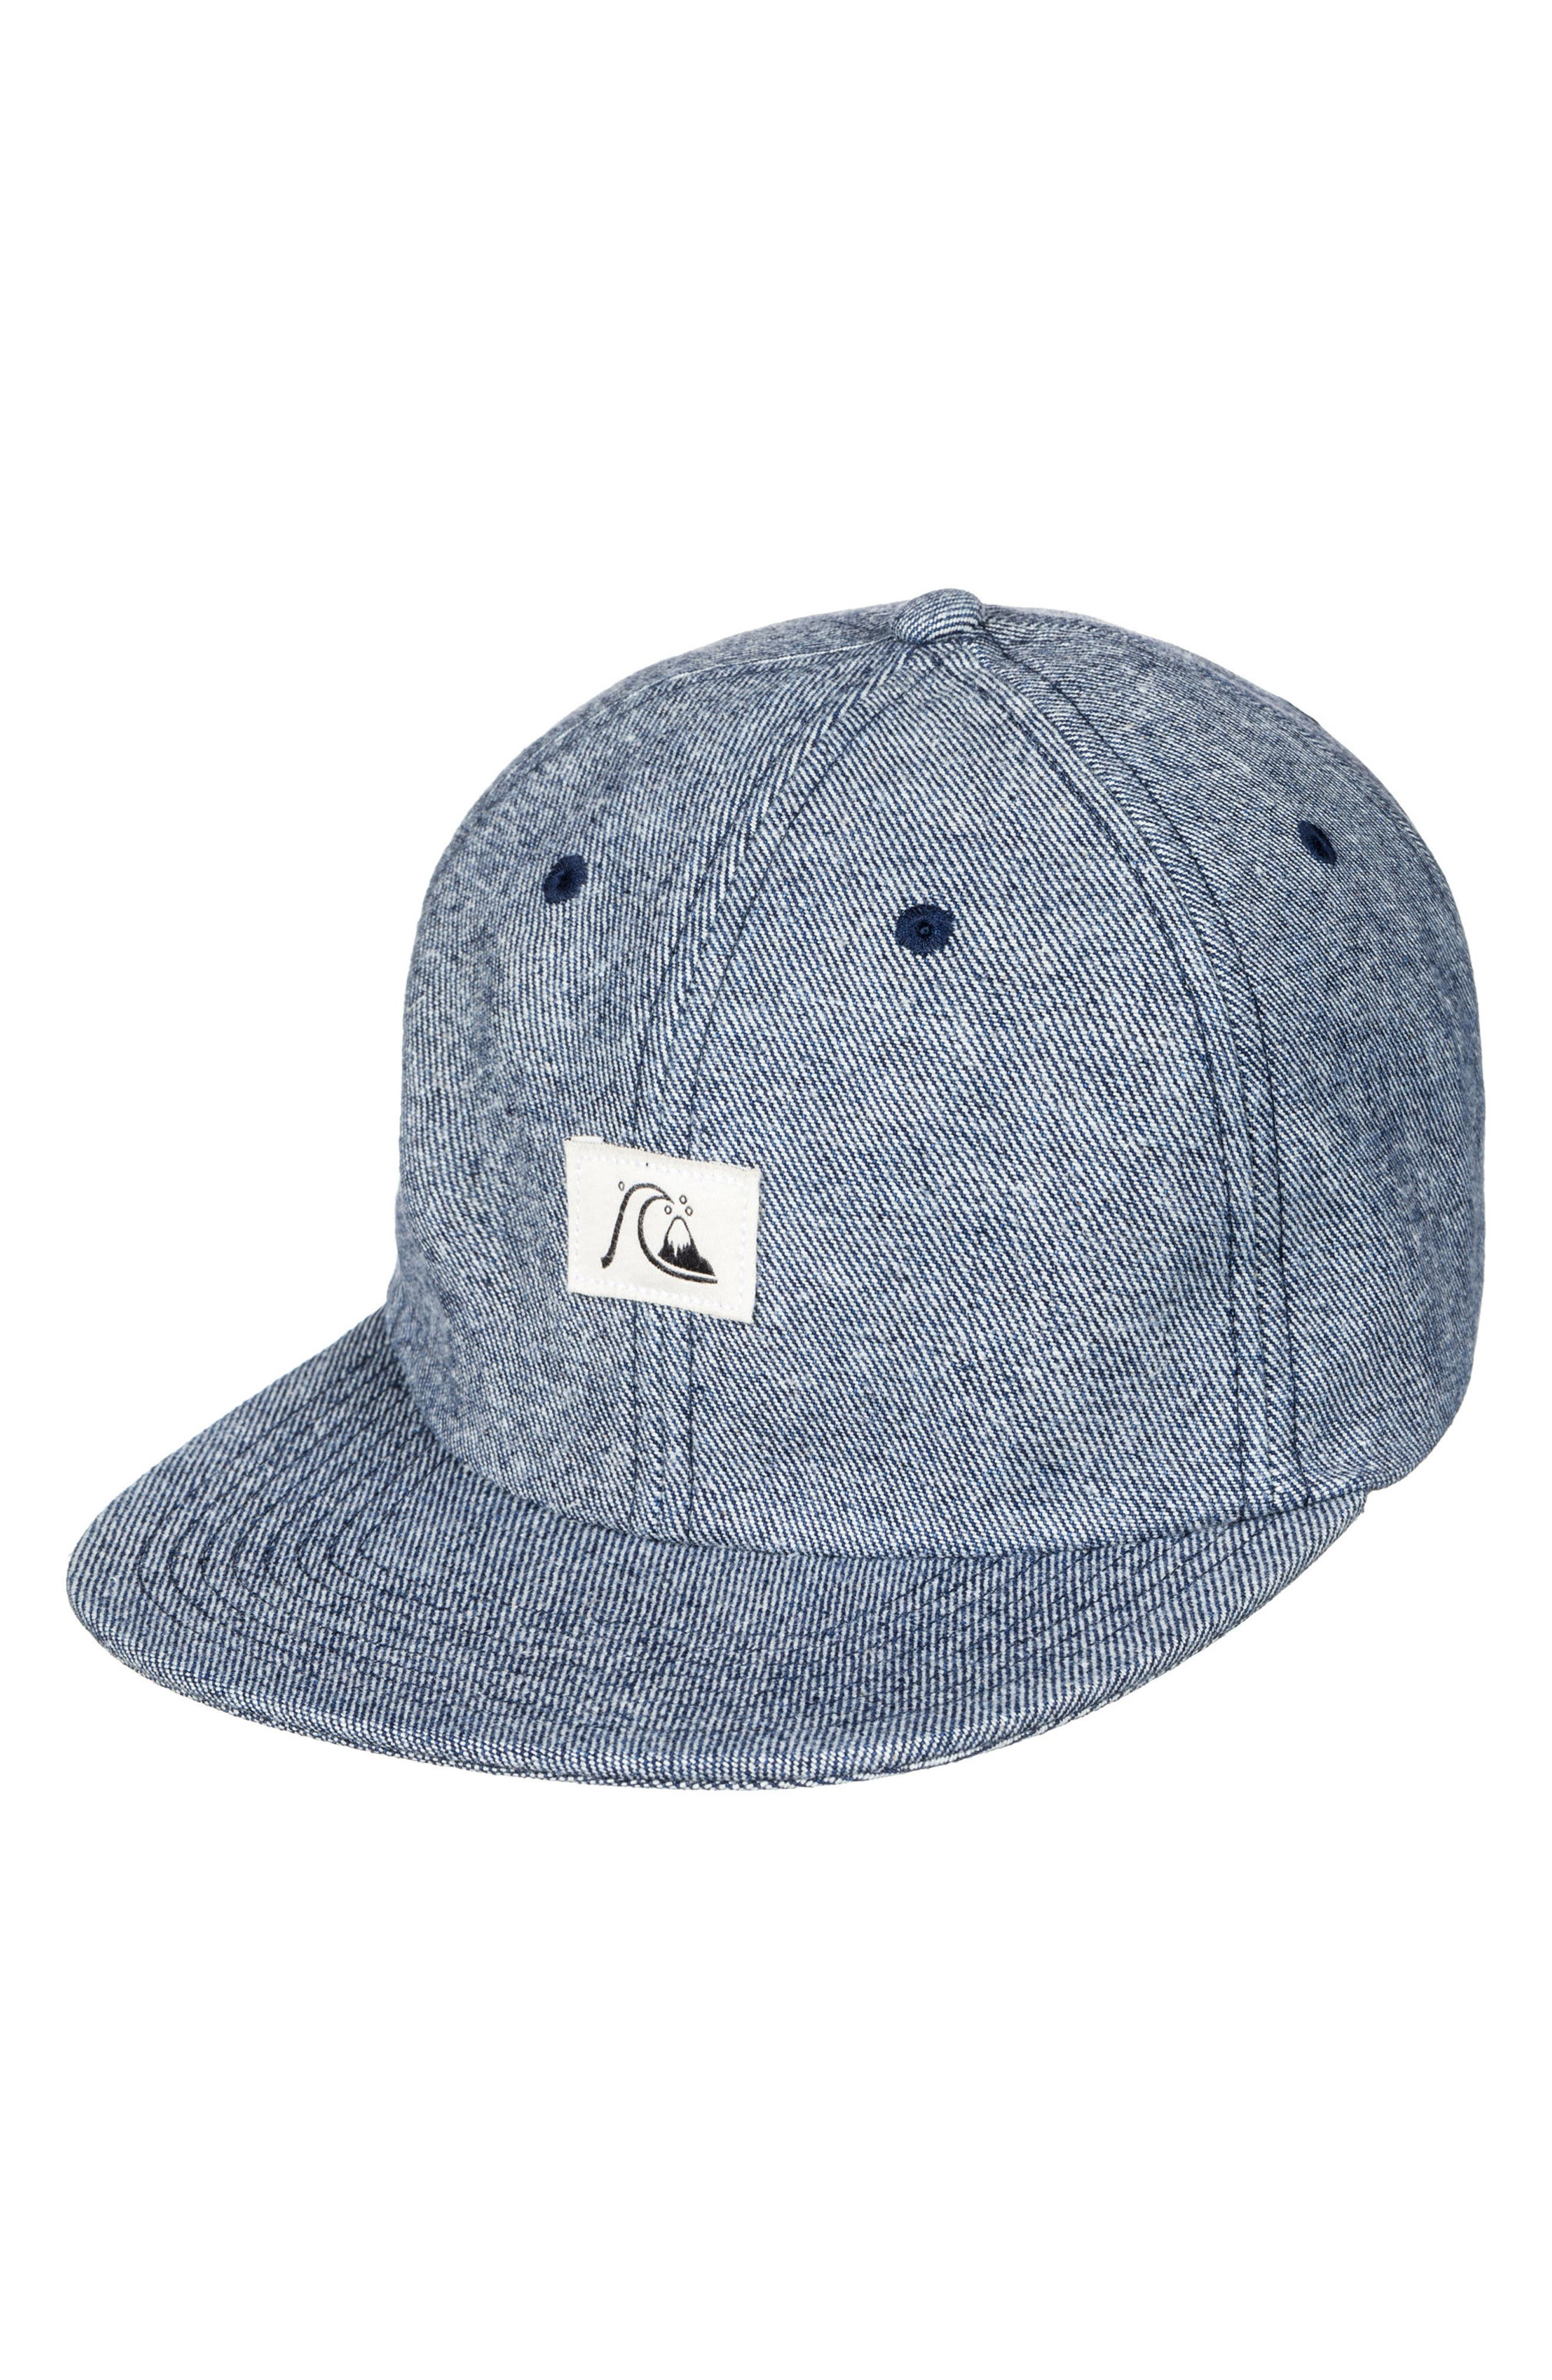 Pinchfield Snapback Baseball Cap,                         Main,                         color, 427